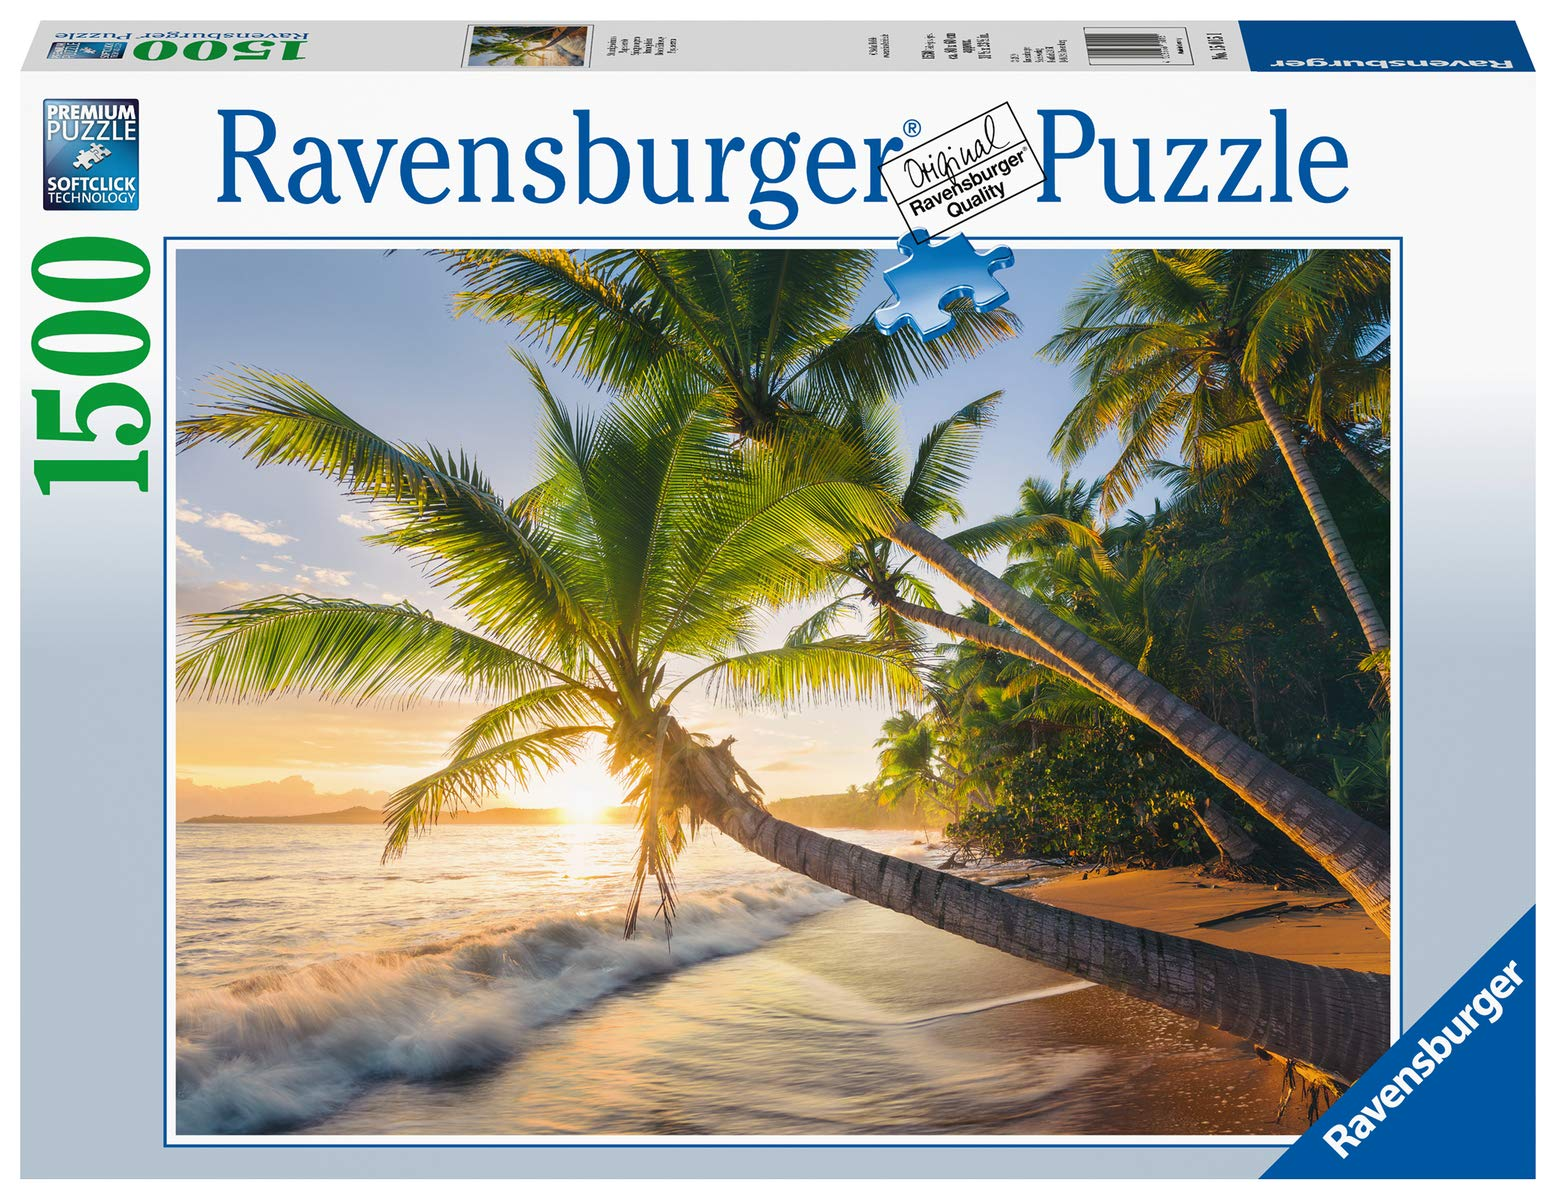 Ravensburger-15015-Beach-Hideaway-Strandgeheimnis Ravensburger Puzzle 15015 – Strandgeheimnis – 1500 Teile -